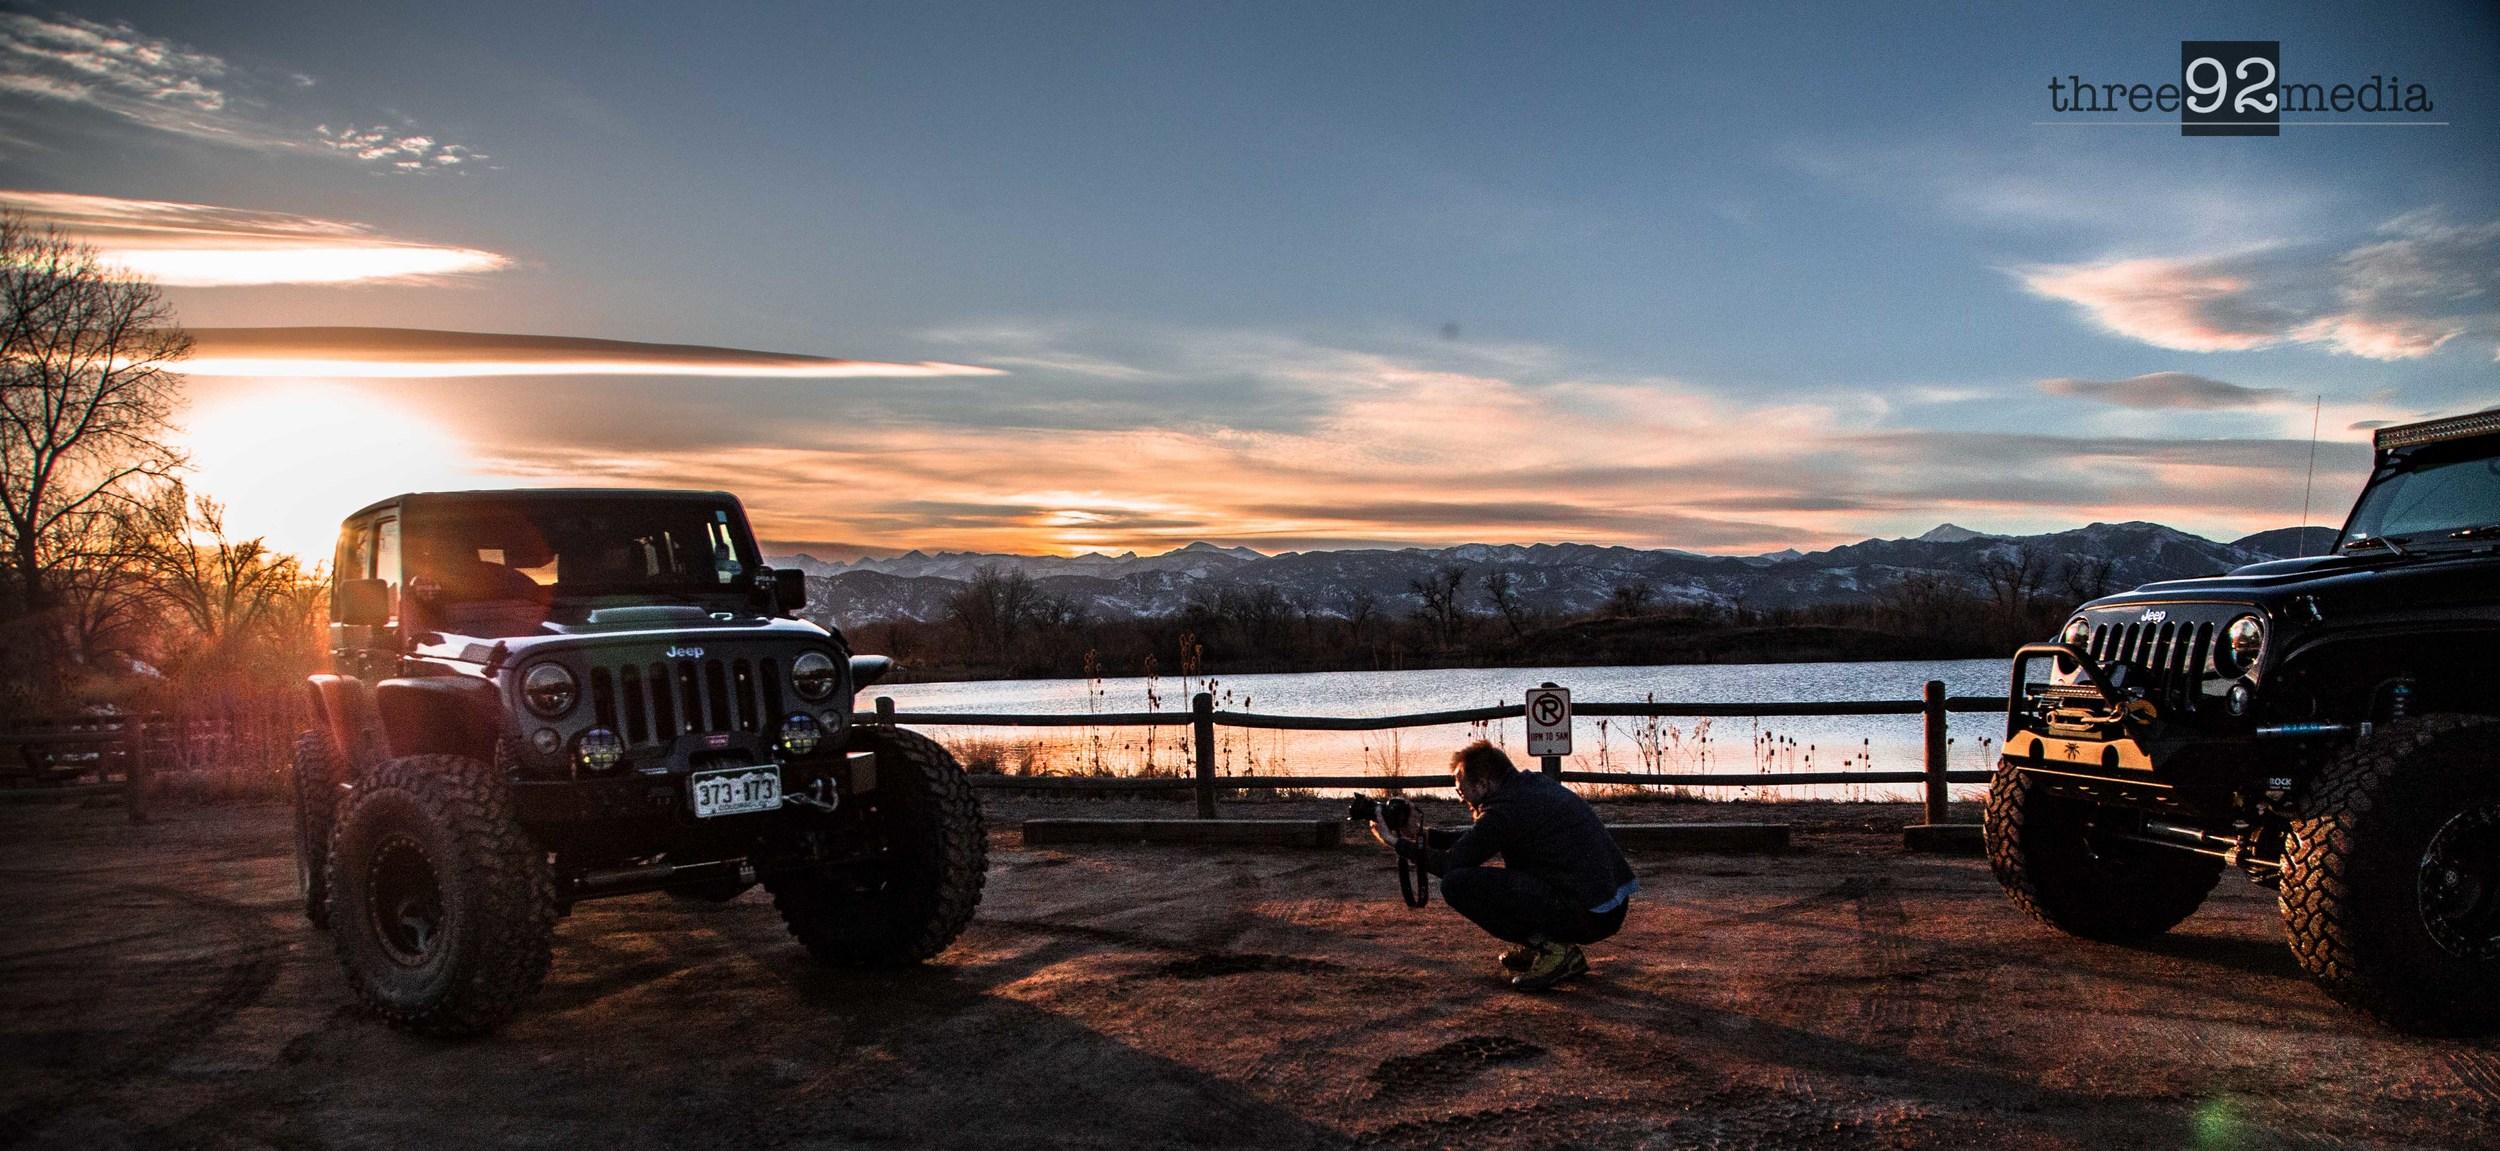 Another Sunset Photoshoot